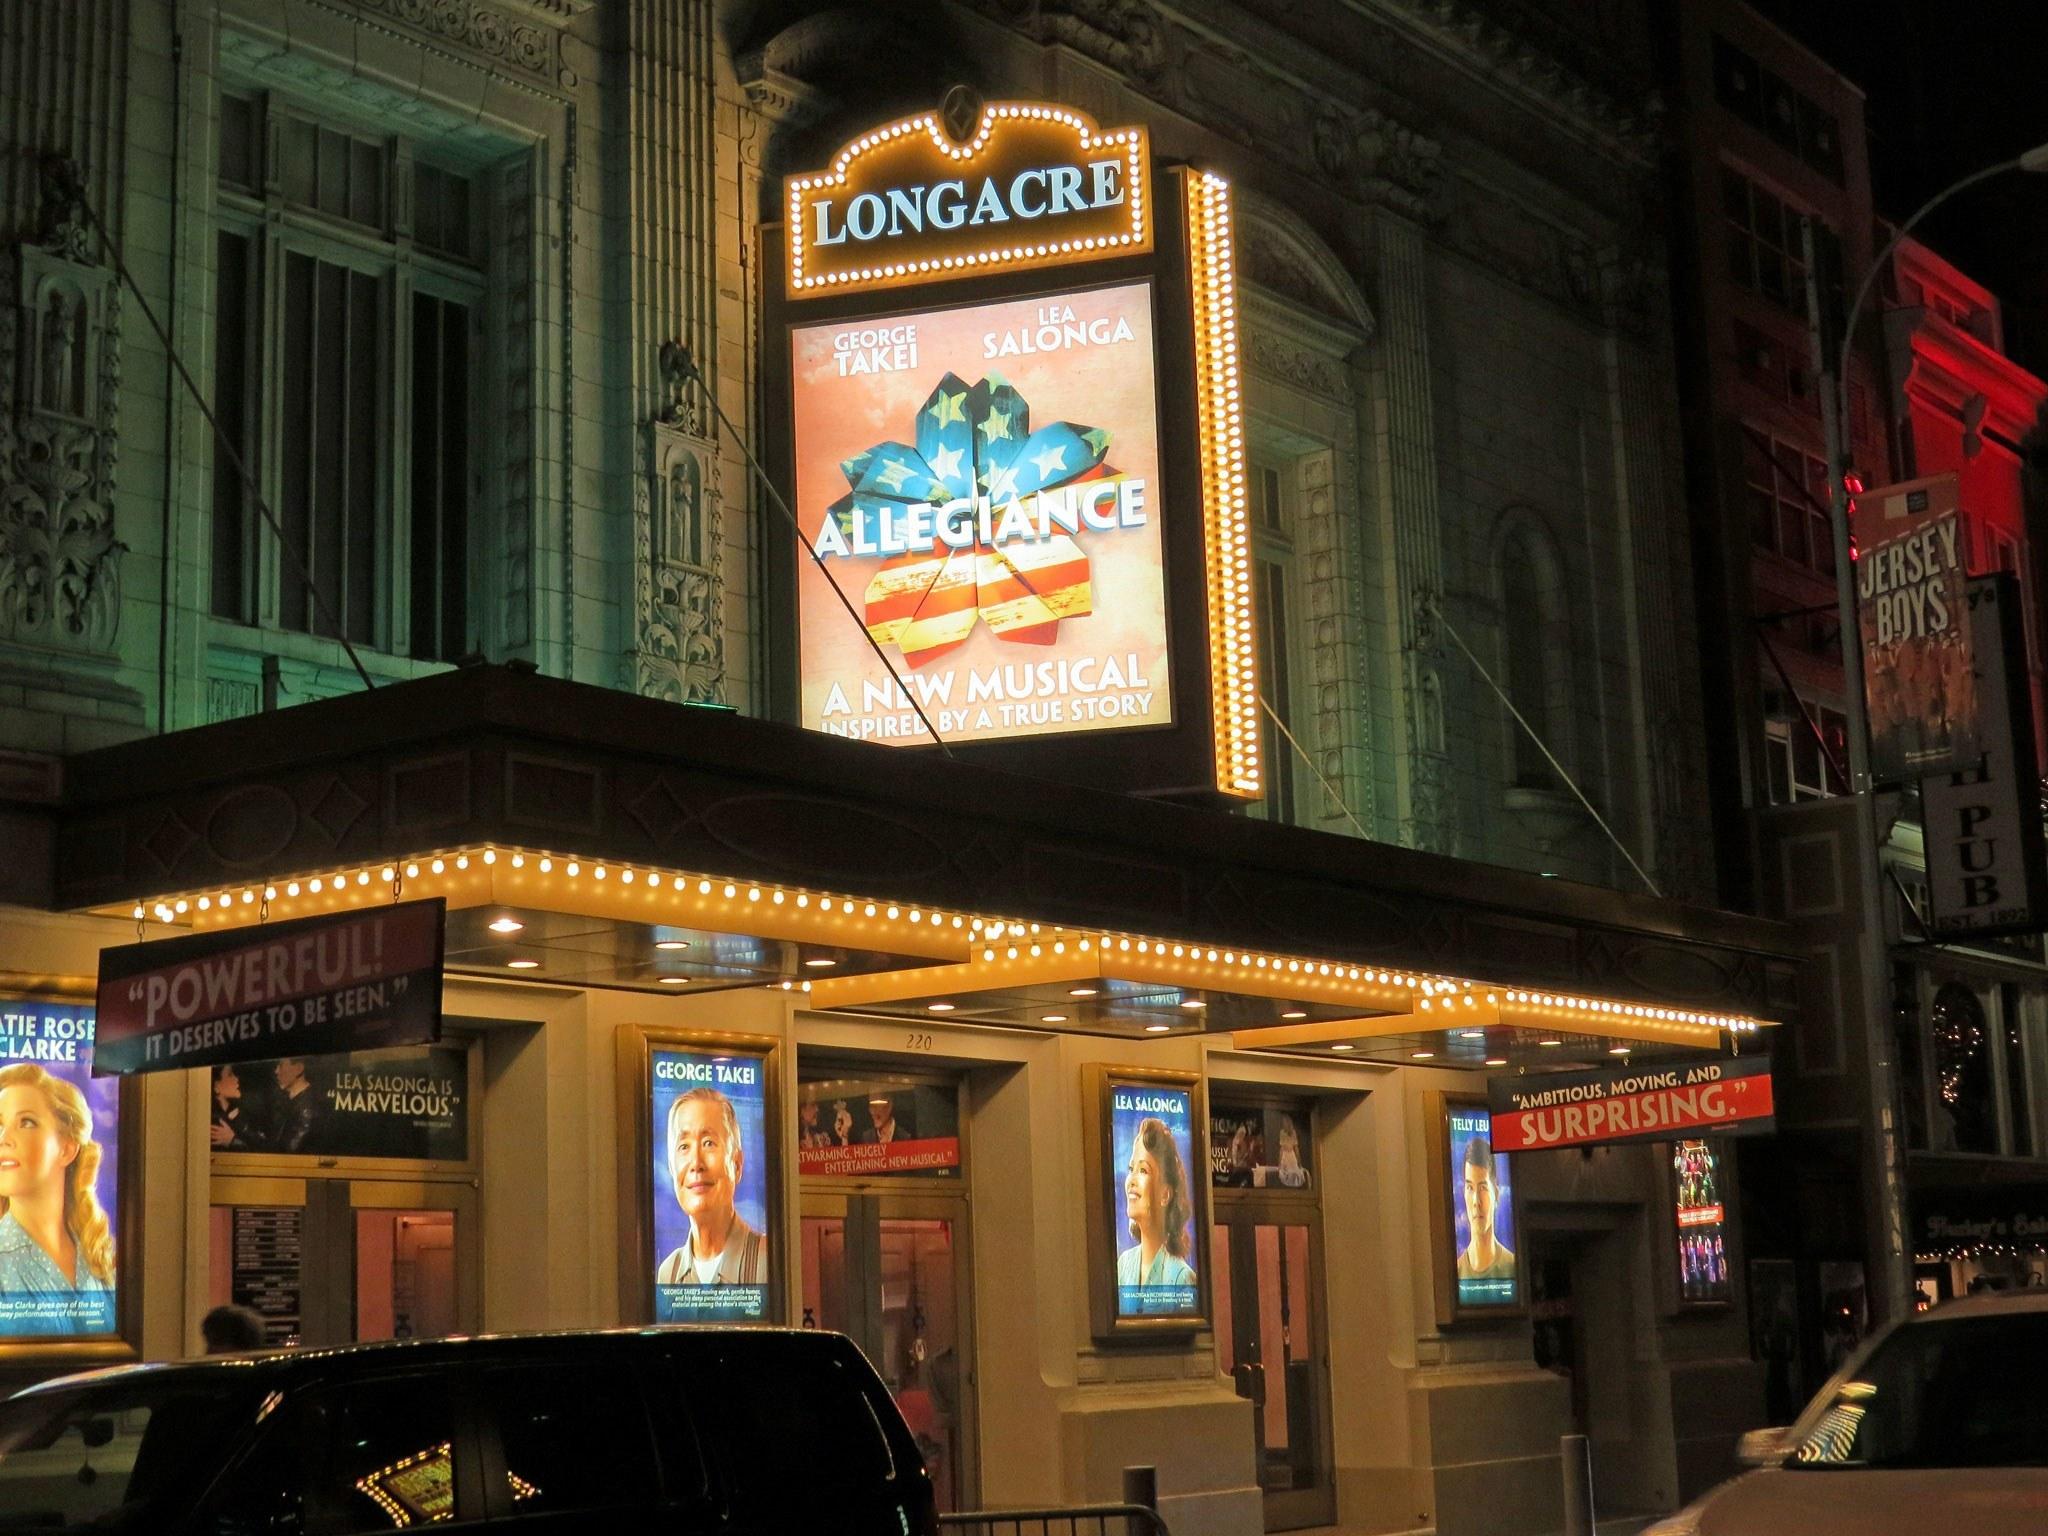 Allegiance Broadway Longacre Theatre Marquee